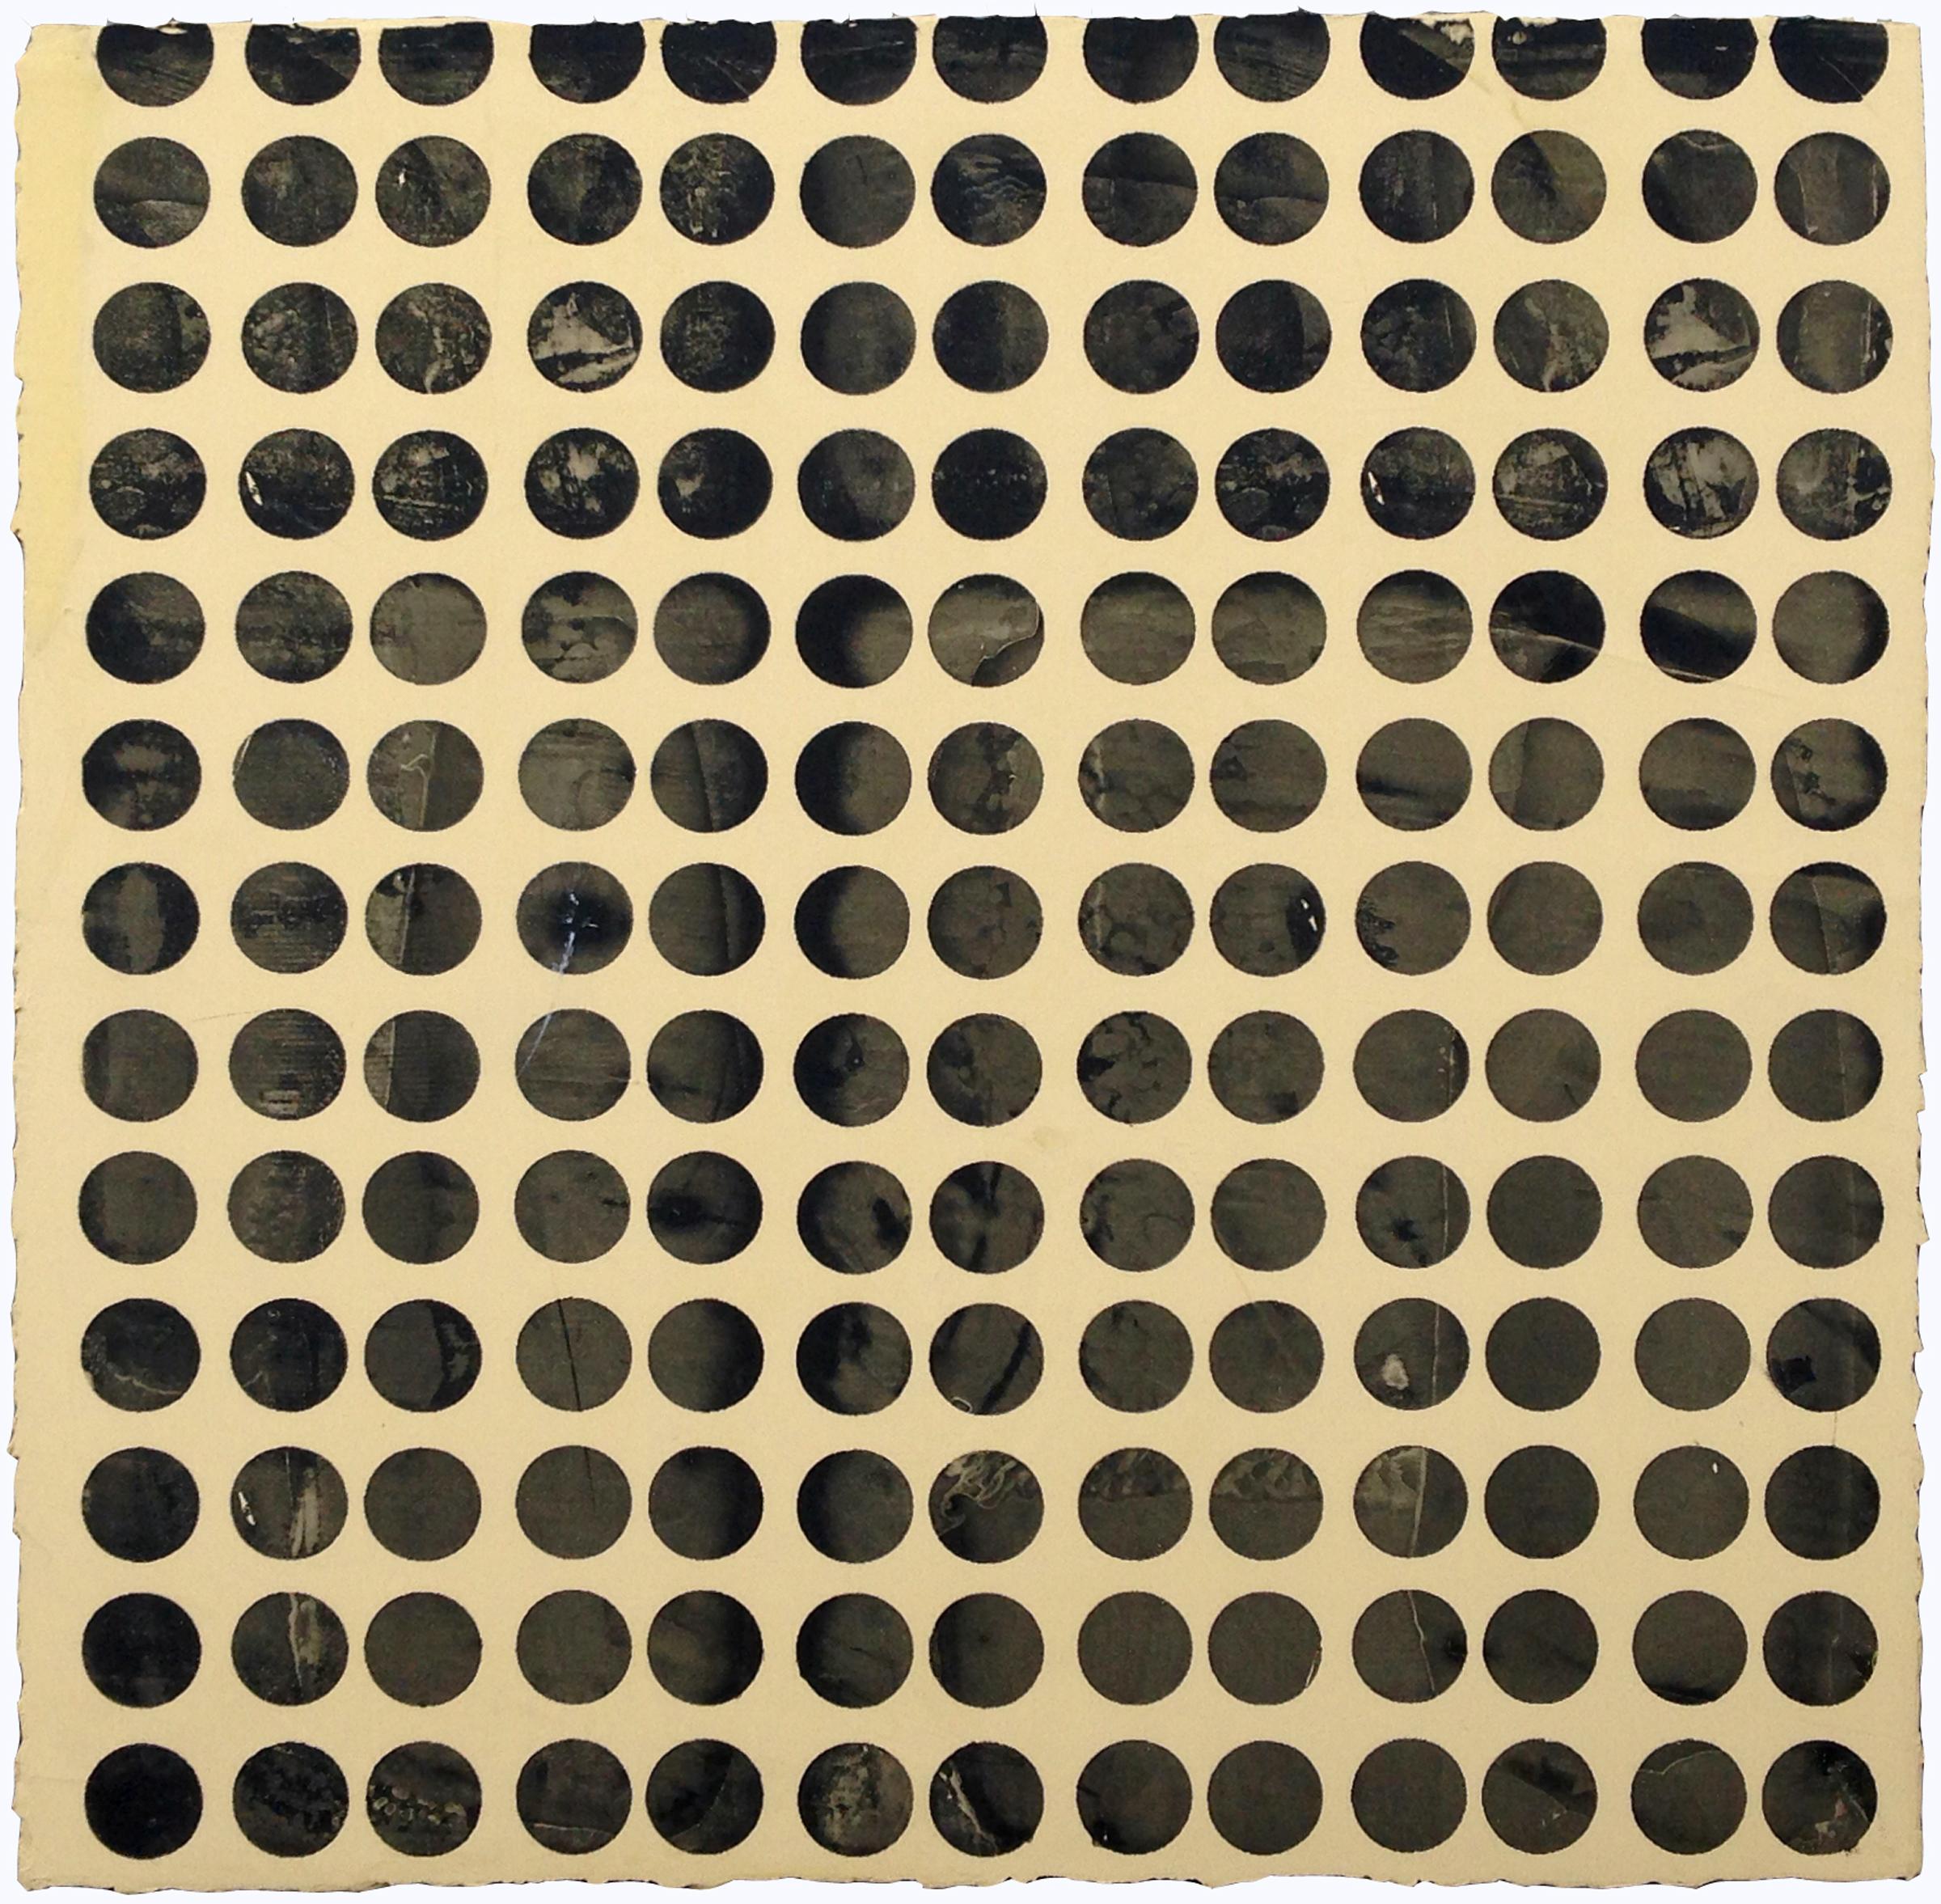 "ELISE FERGUSON   Mirage , pigmented plaster on MDF panel, 18"" x 18"", 2014"